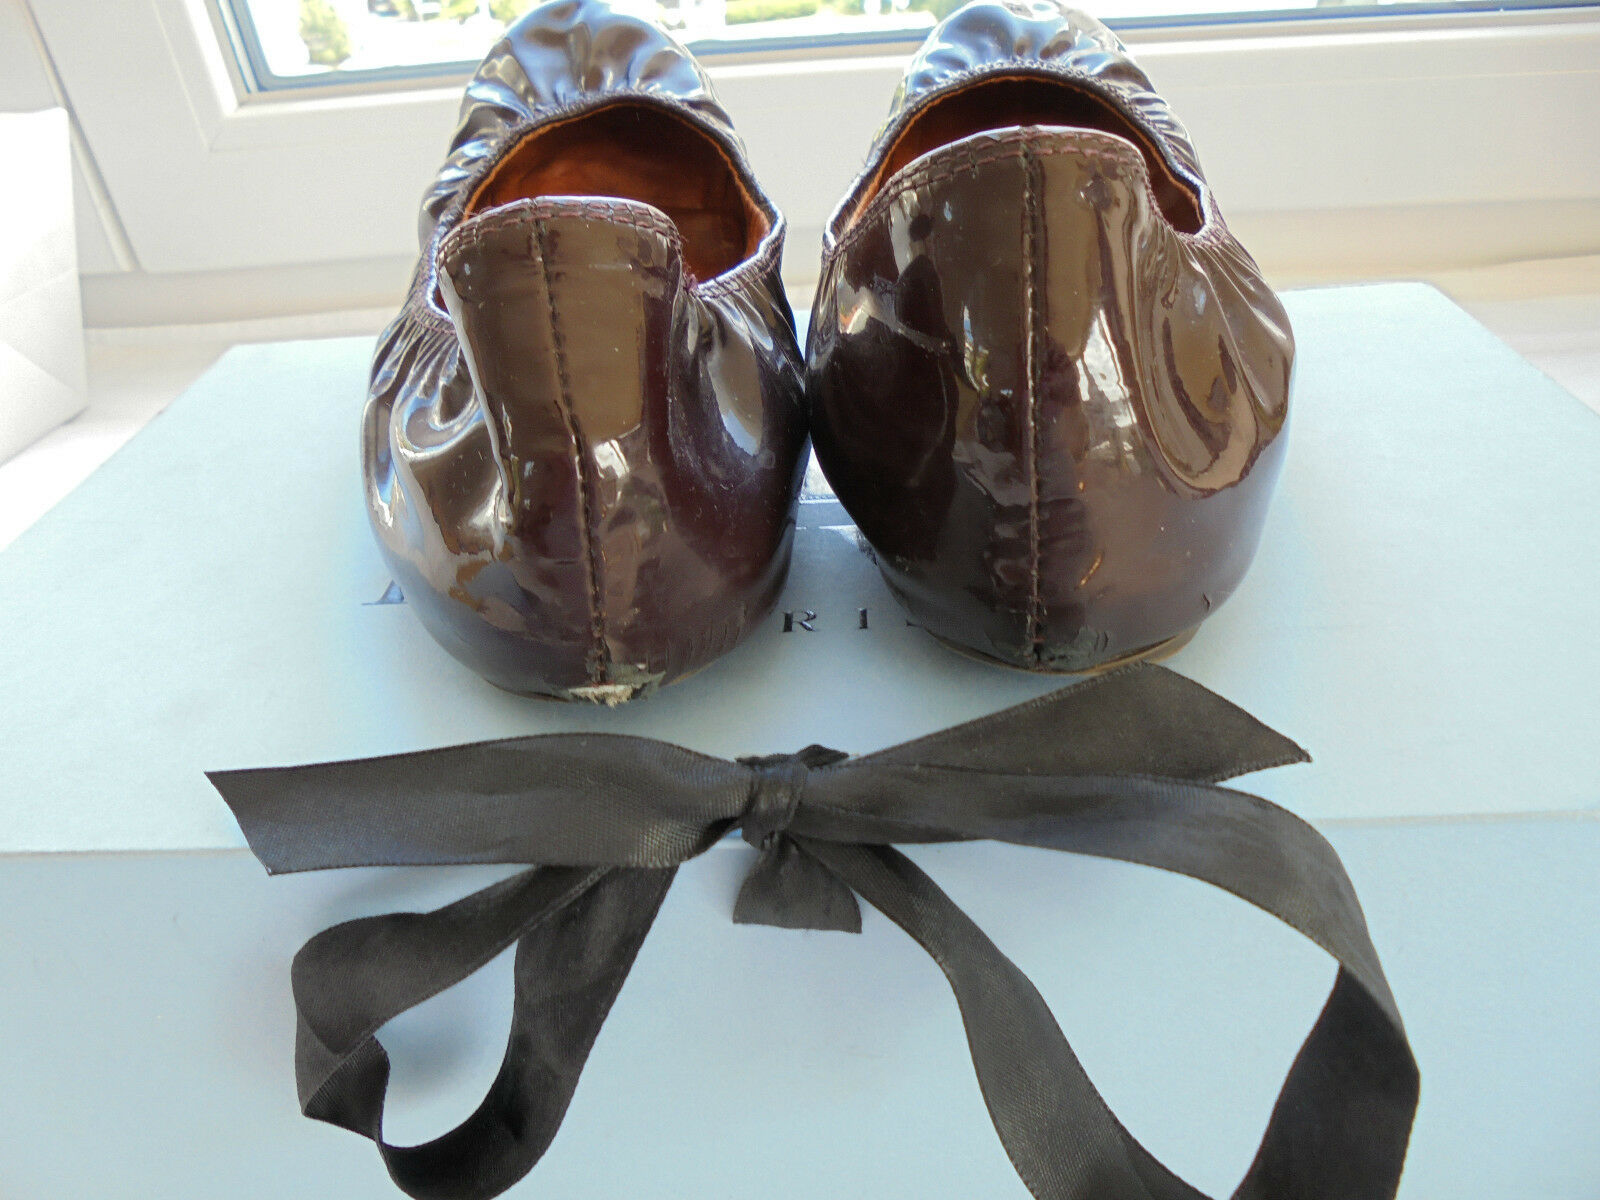 Lanvin Paris Lackleder Ballerinas NP  + OVP Karton Karton OVP Schuhe Pumps 36 36,5 37 8074ab